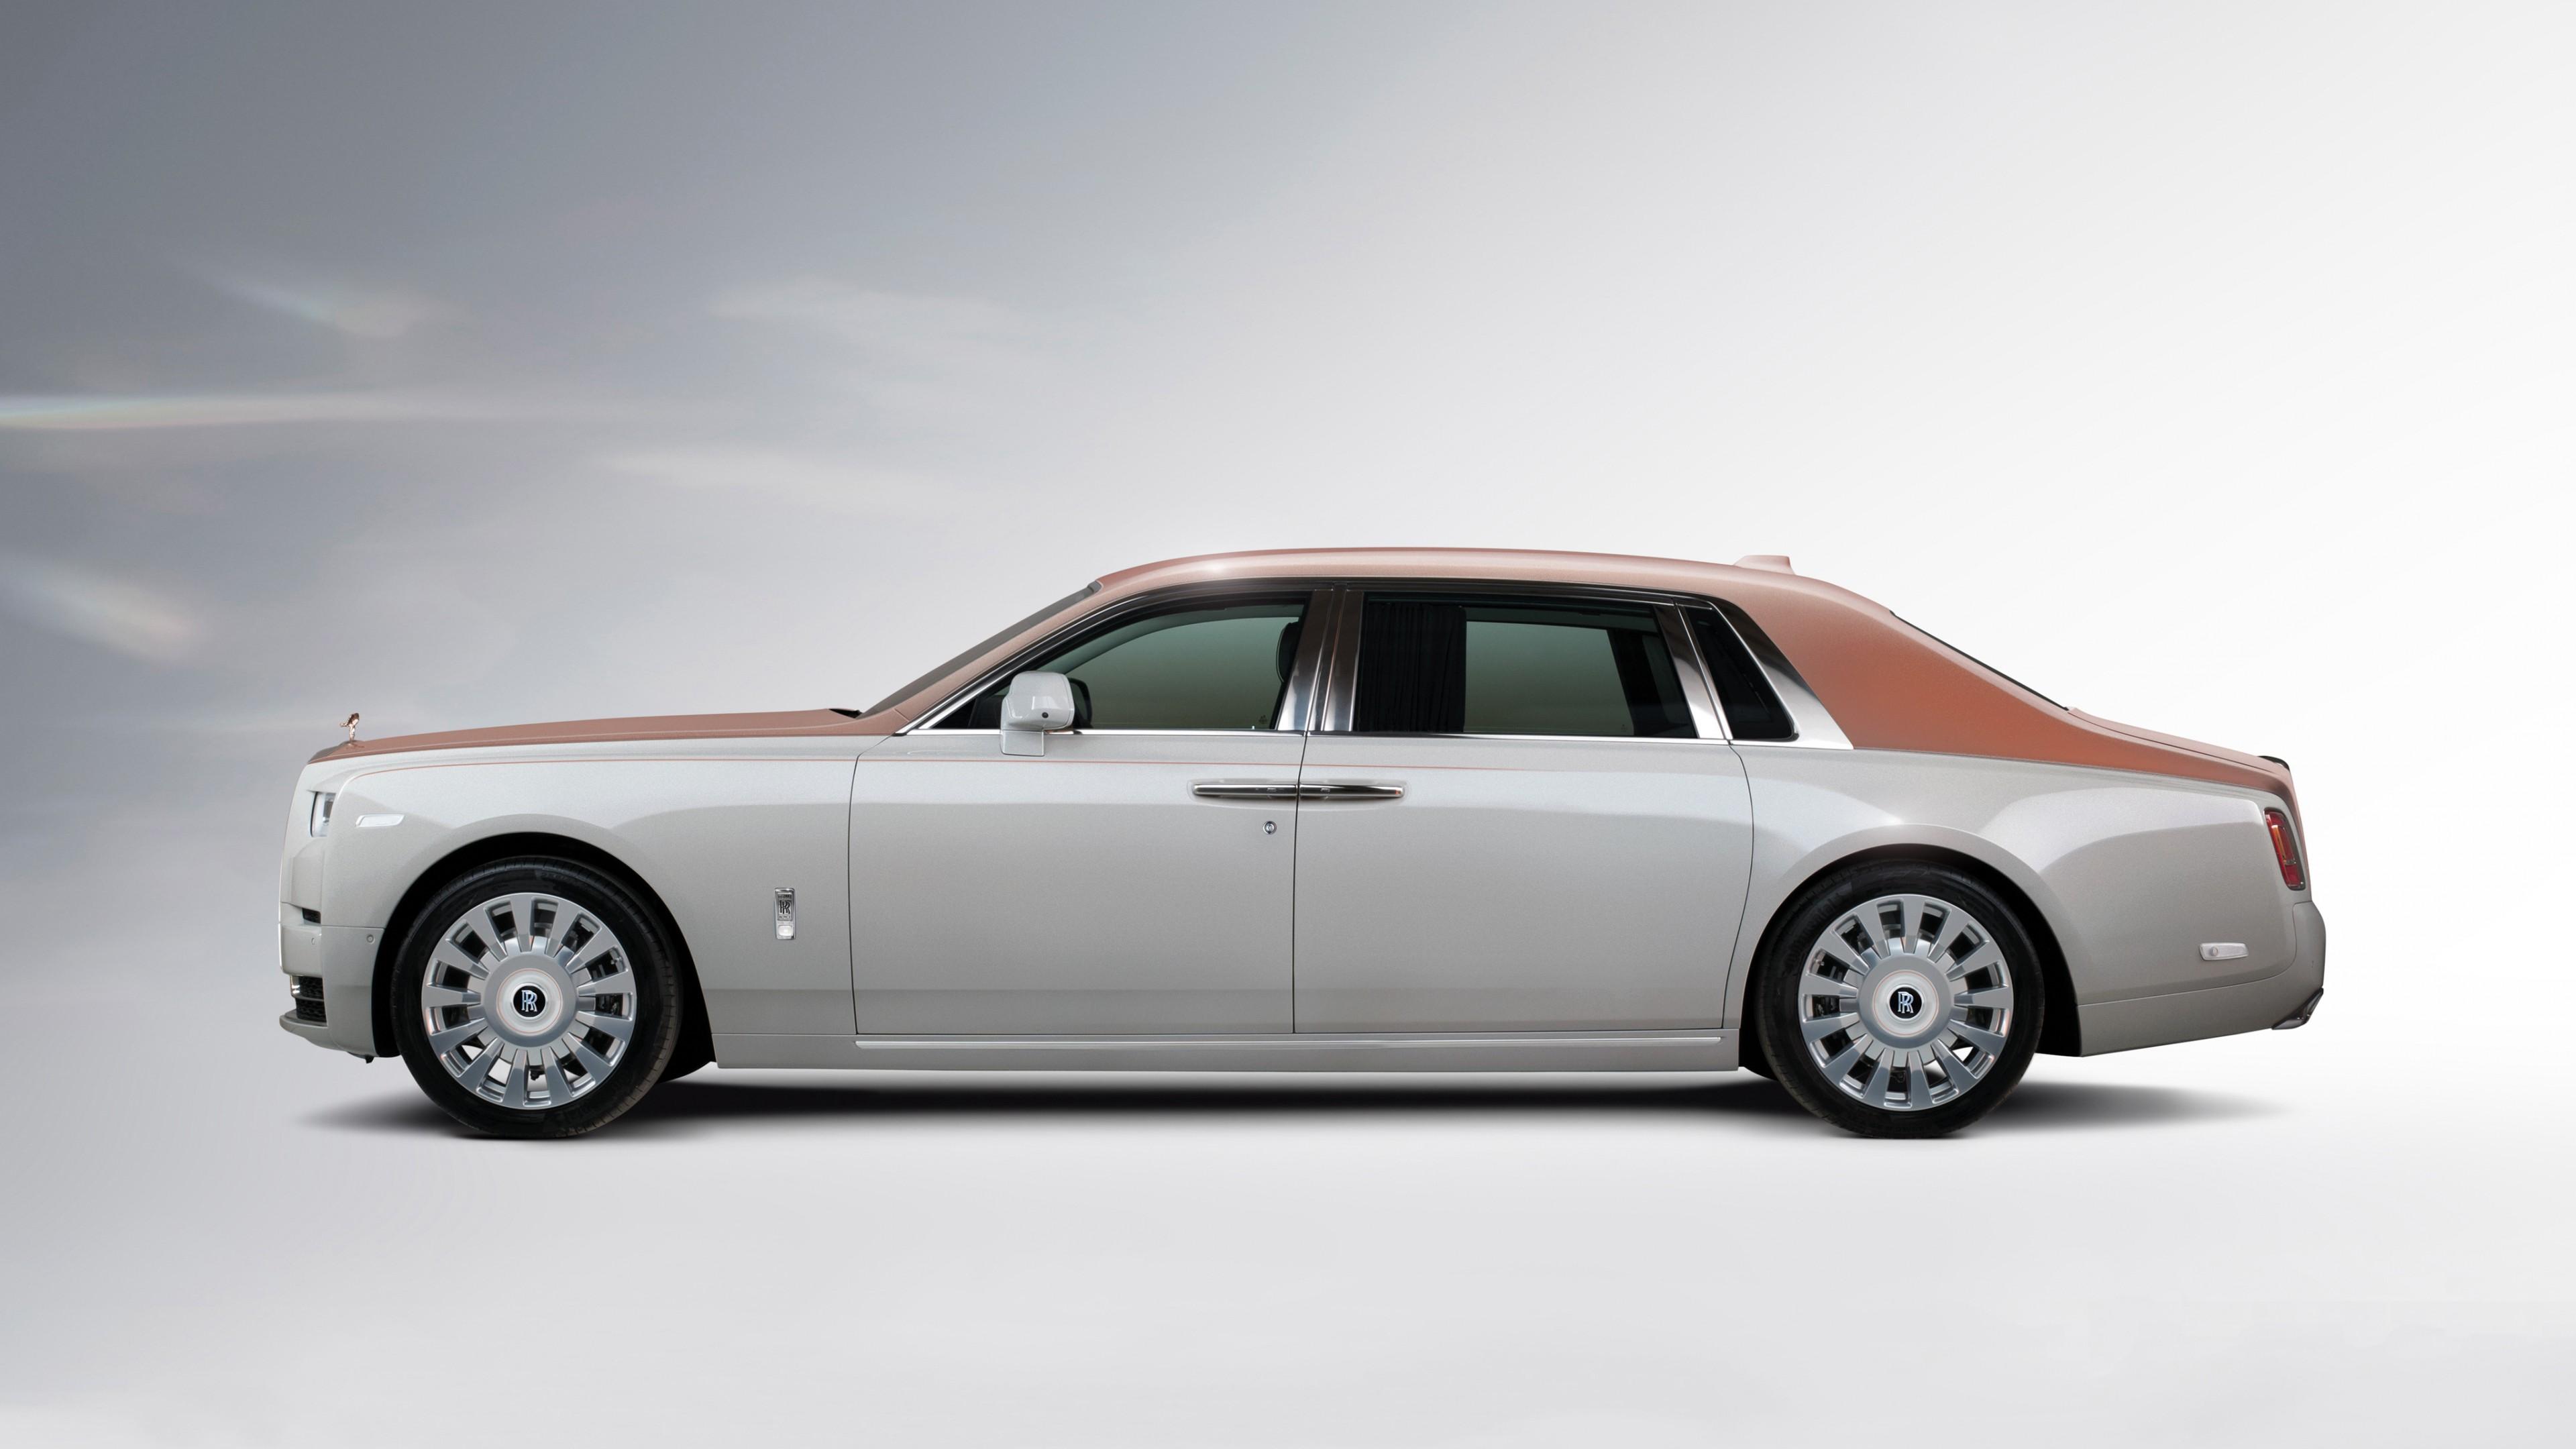 2018 Rolls Royce Phantom EWB Whispered Muse 4K Wallpaper ...